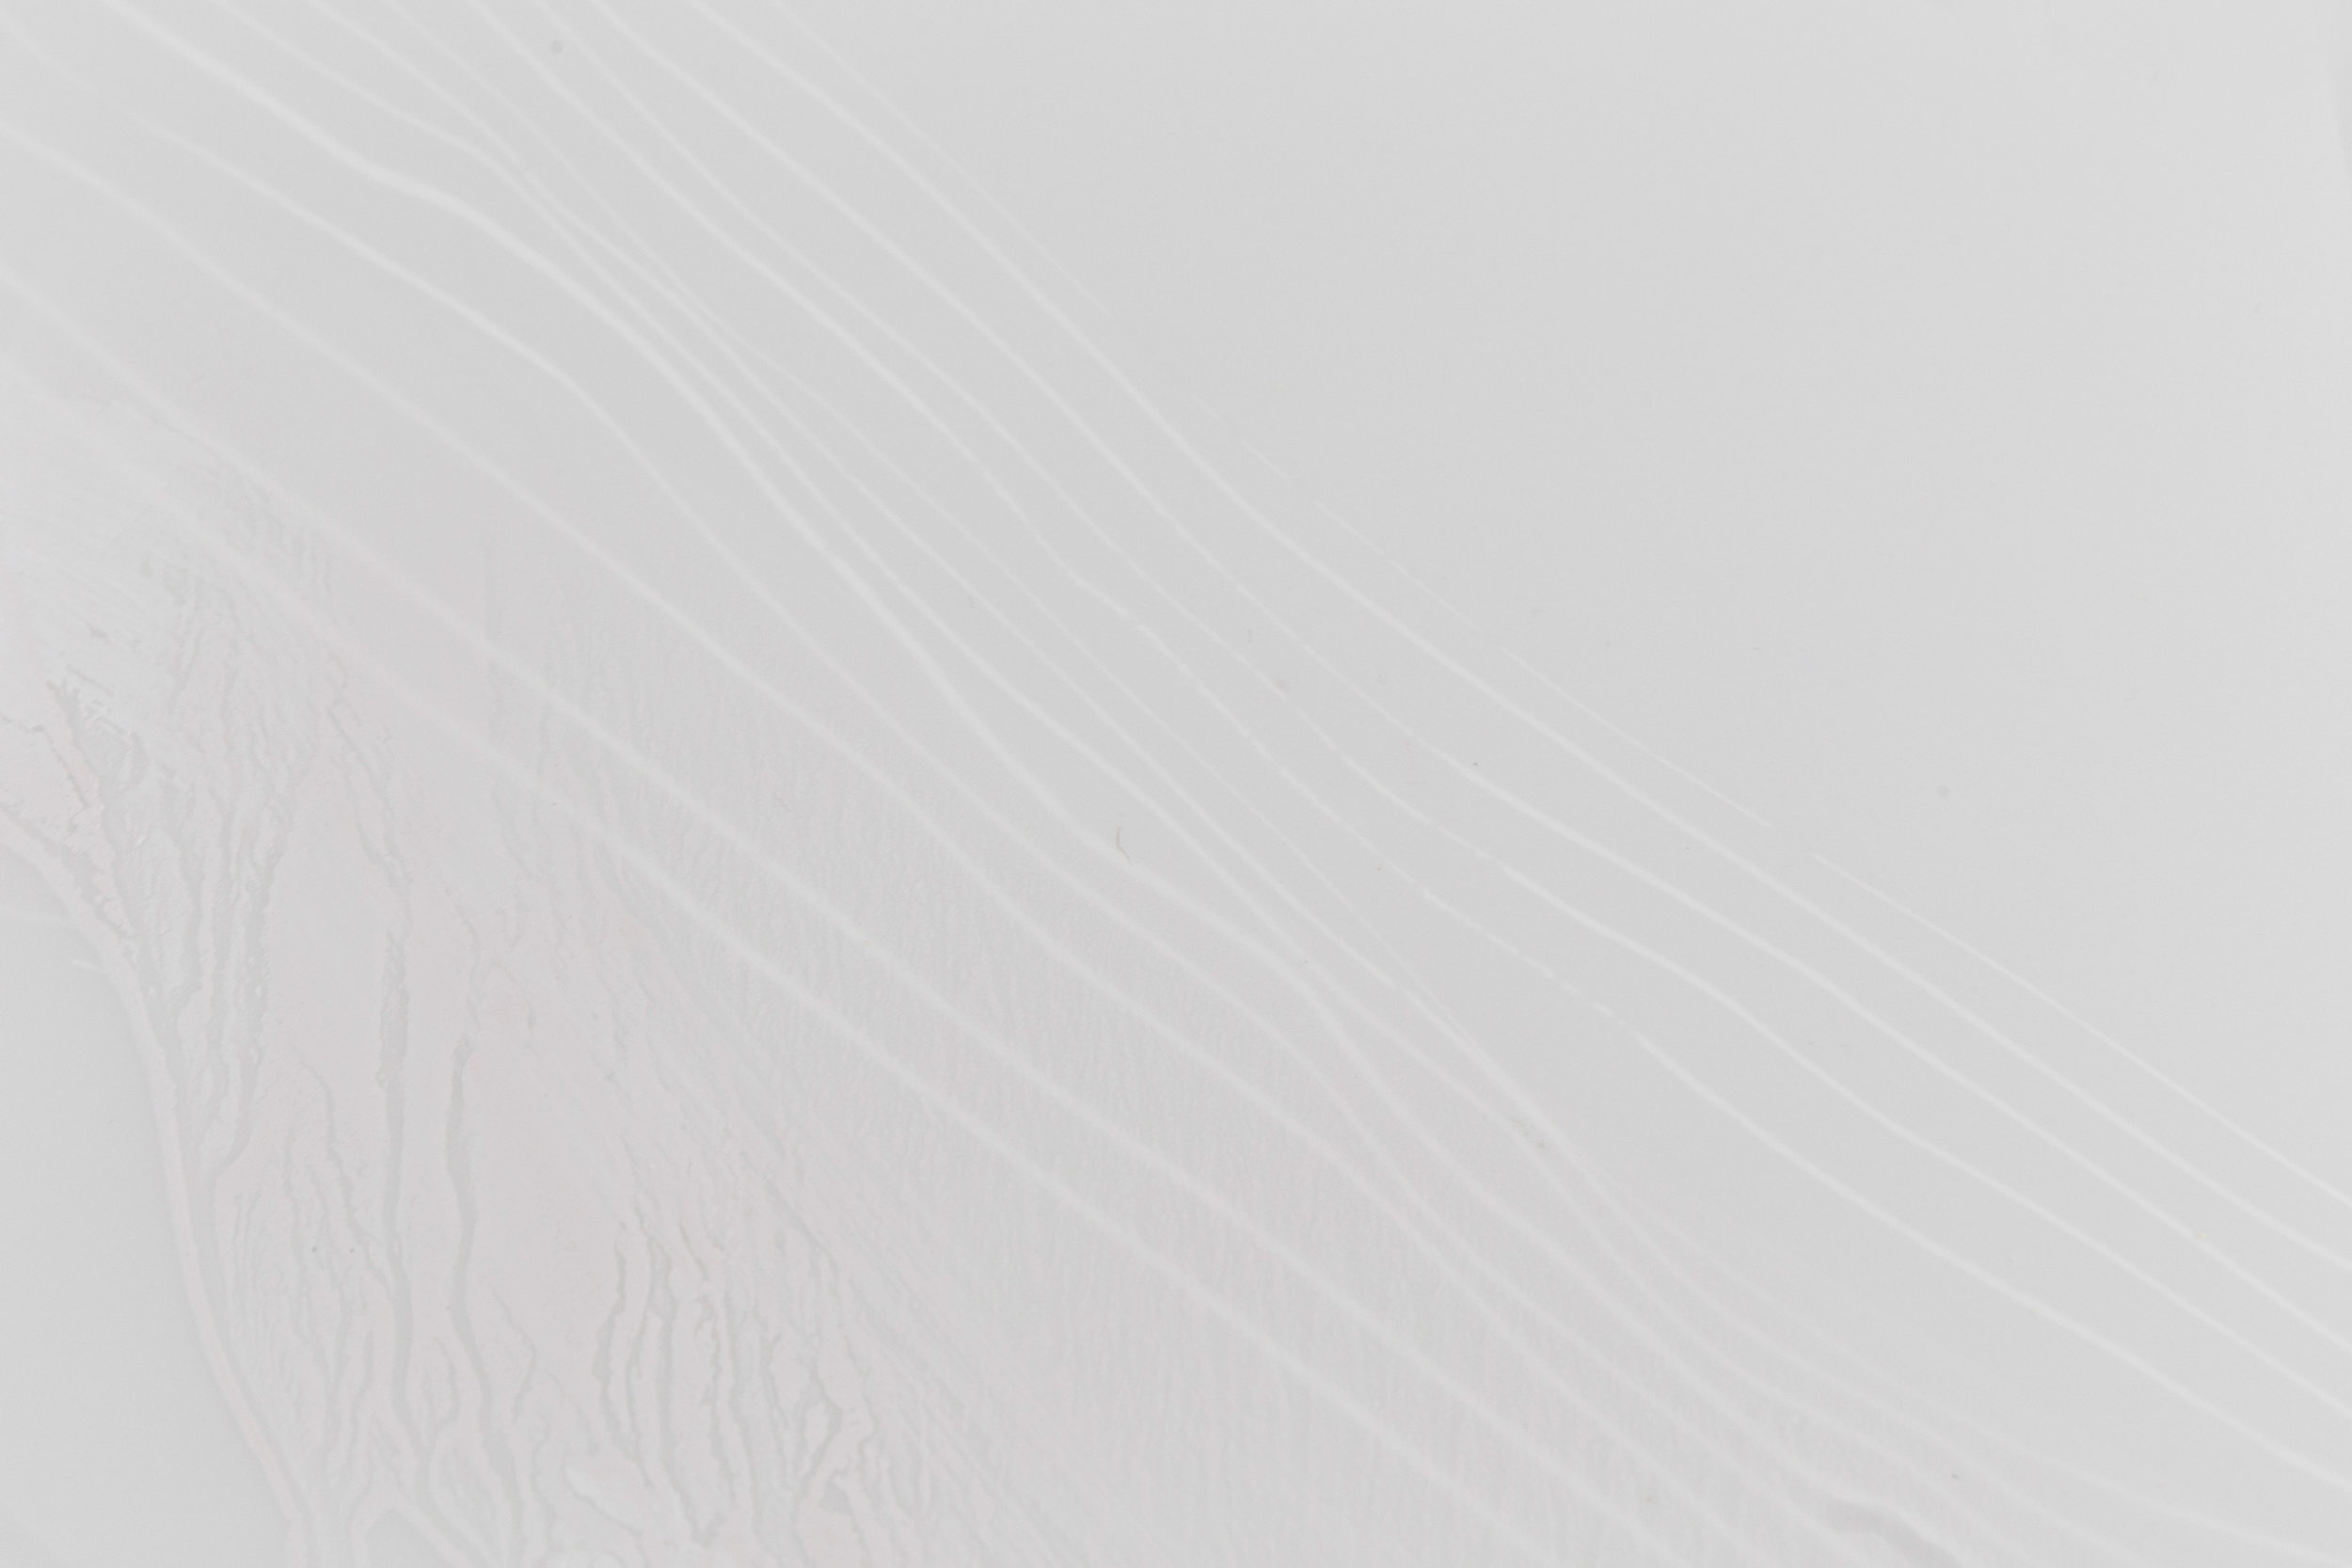 LulaJapan-14.jpg